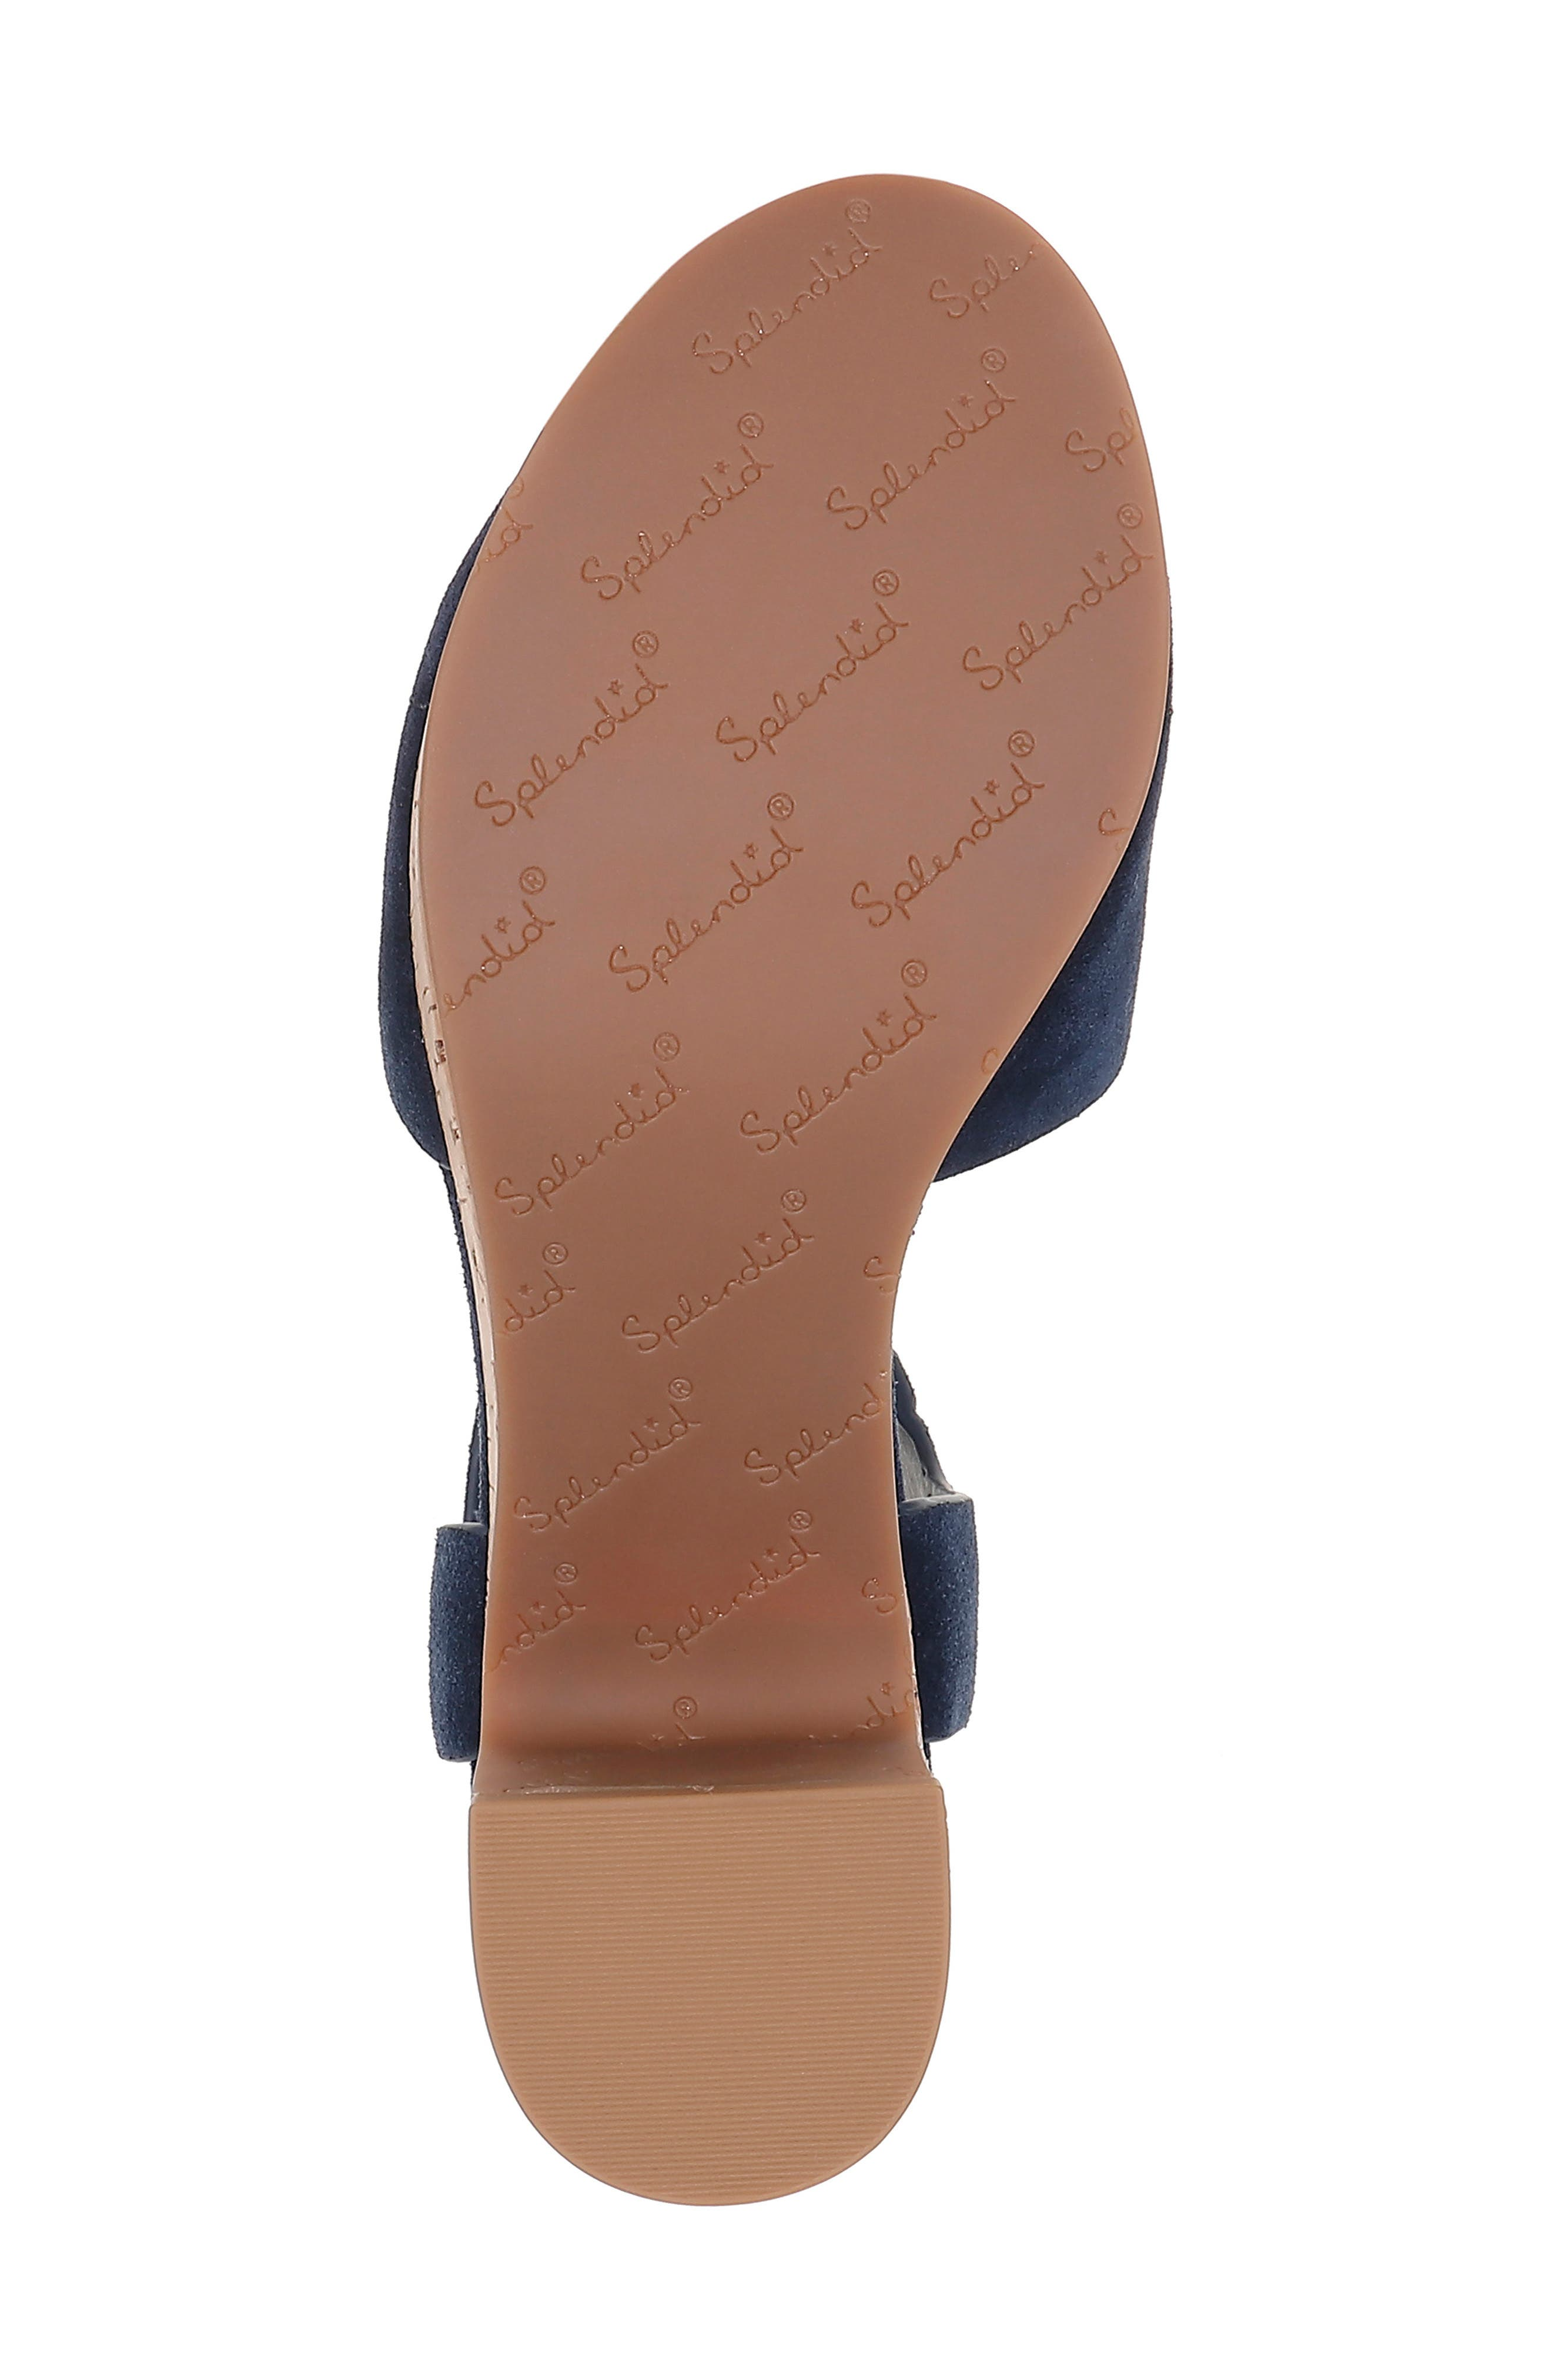 SPLENDID, Thatcher Platform Ankle Strap Sandal, Alternate thumbnail 6, color, NAVY SUEDE